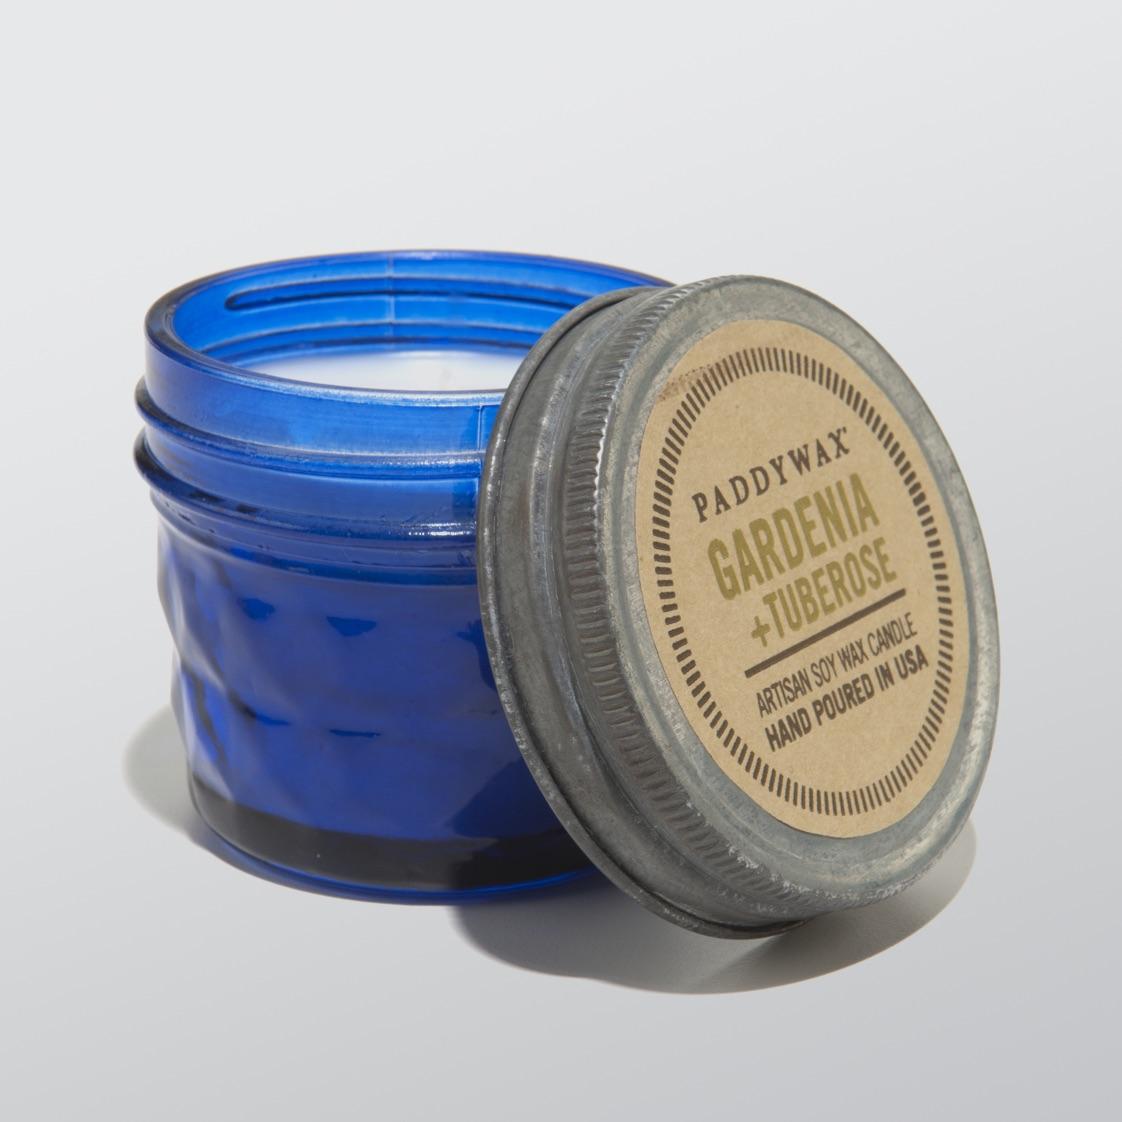 Gardenia & Tuberose Relish Jar Candle